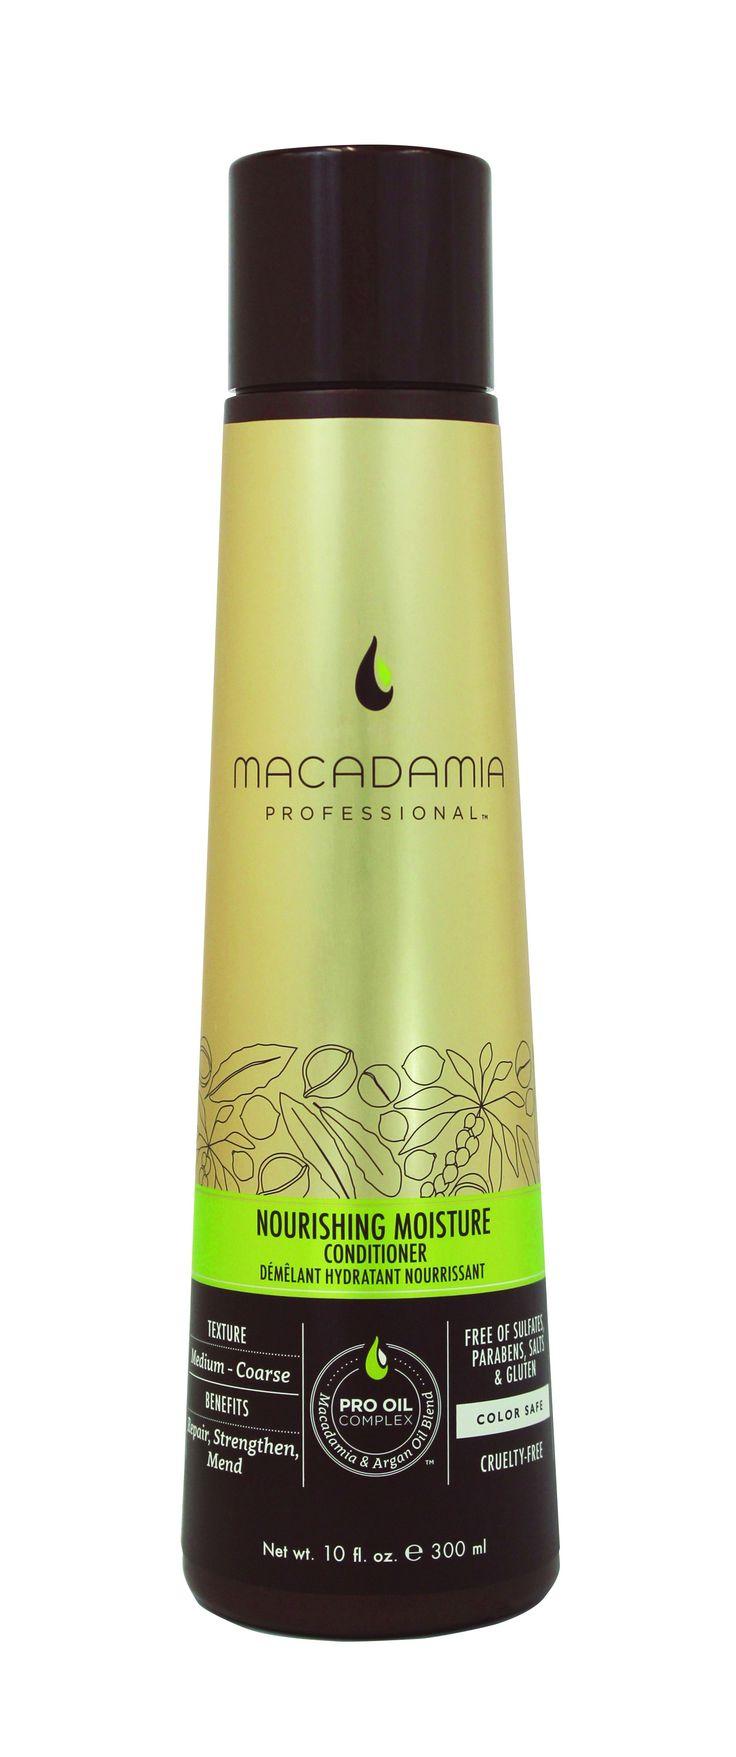 Macadamia Professional Nourishing Moisture Conditioner 300ml.